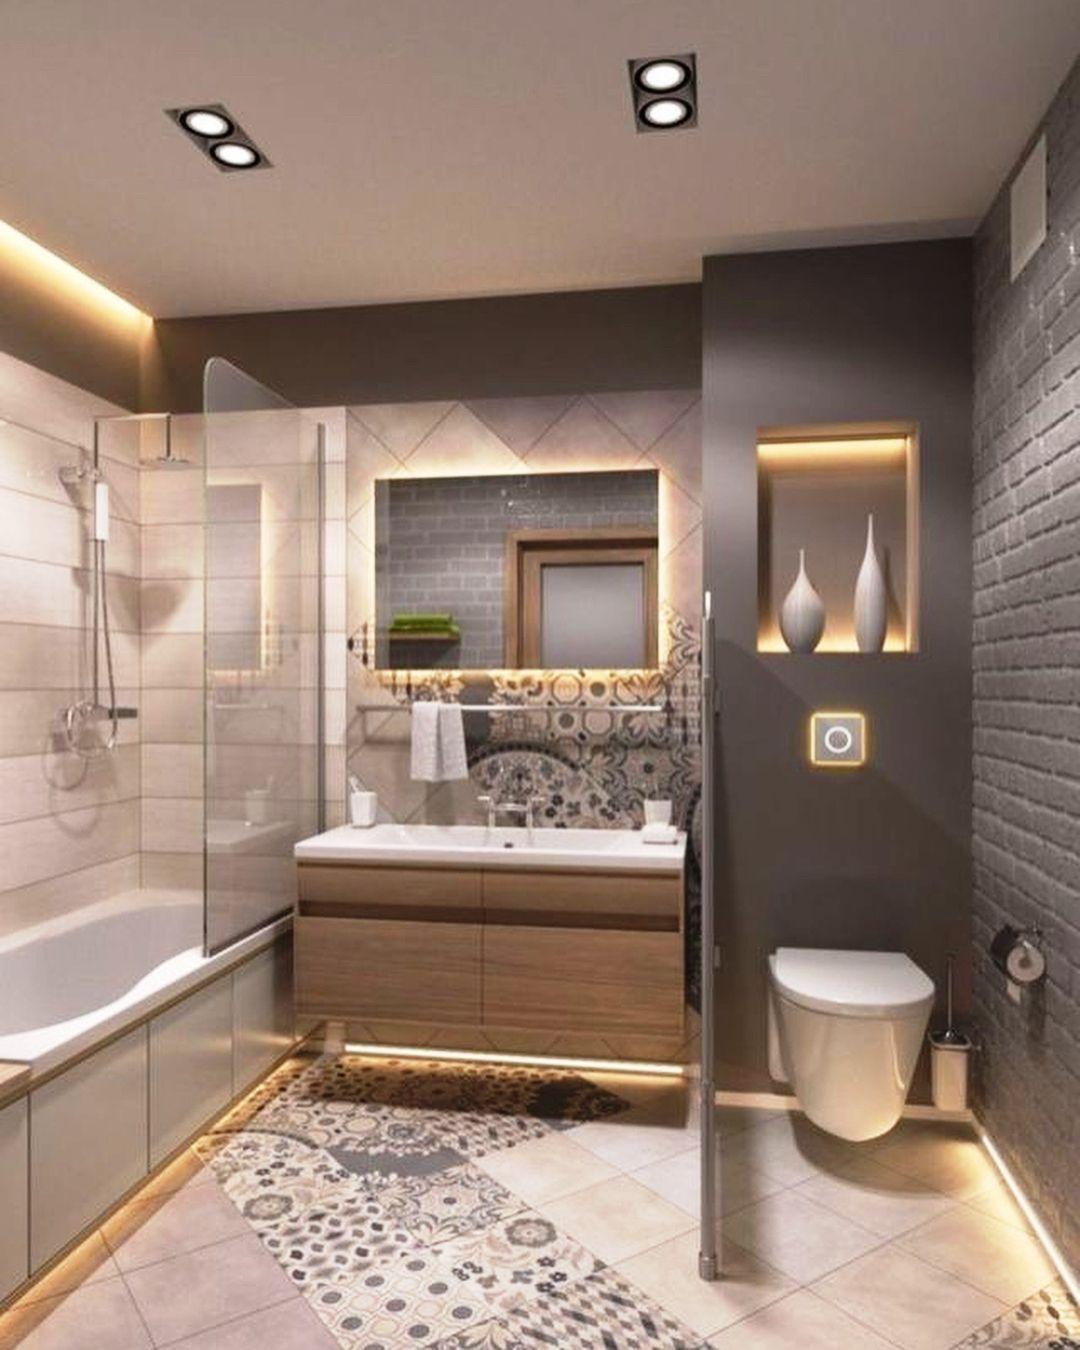 upgrade your house with modern minimalist bathroom design ideas rh pinterest com